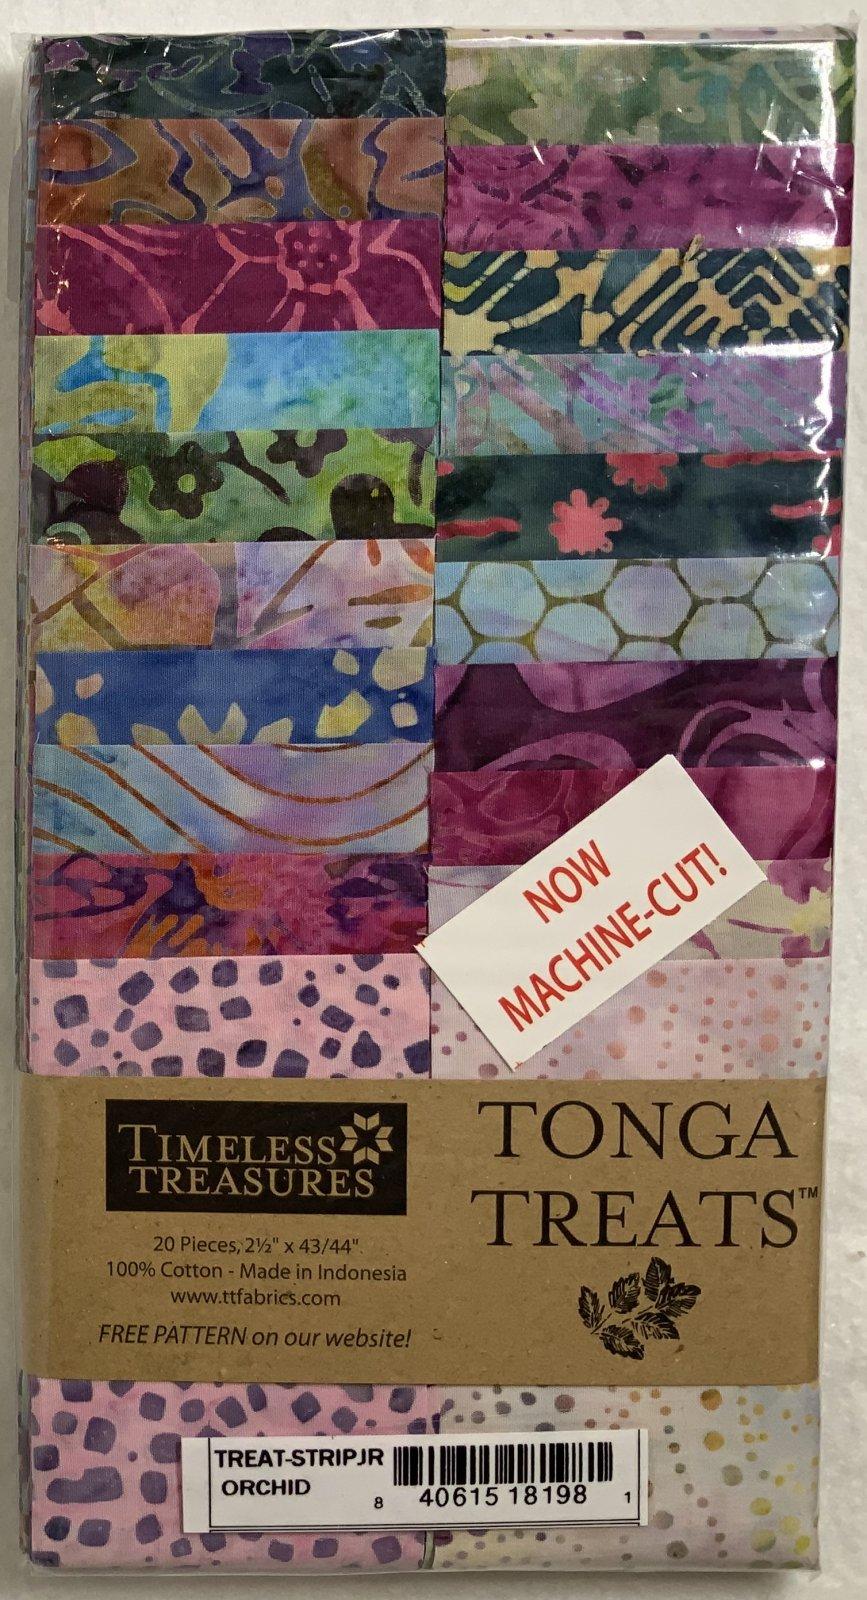 Tonga Treat Strip JR Orchid, (20 pcs 2.5 x44) - Timeless Treasures